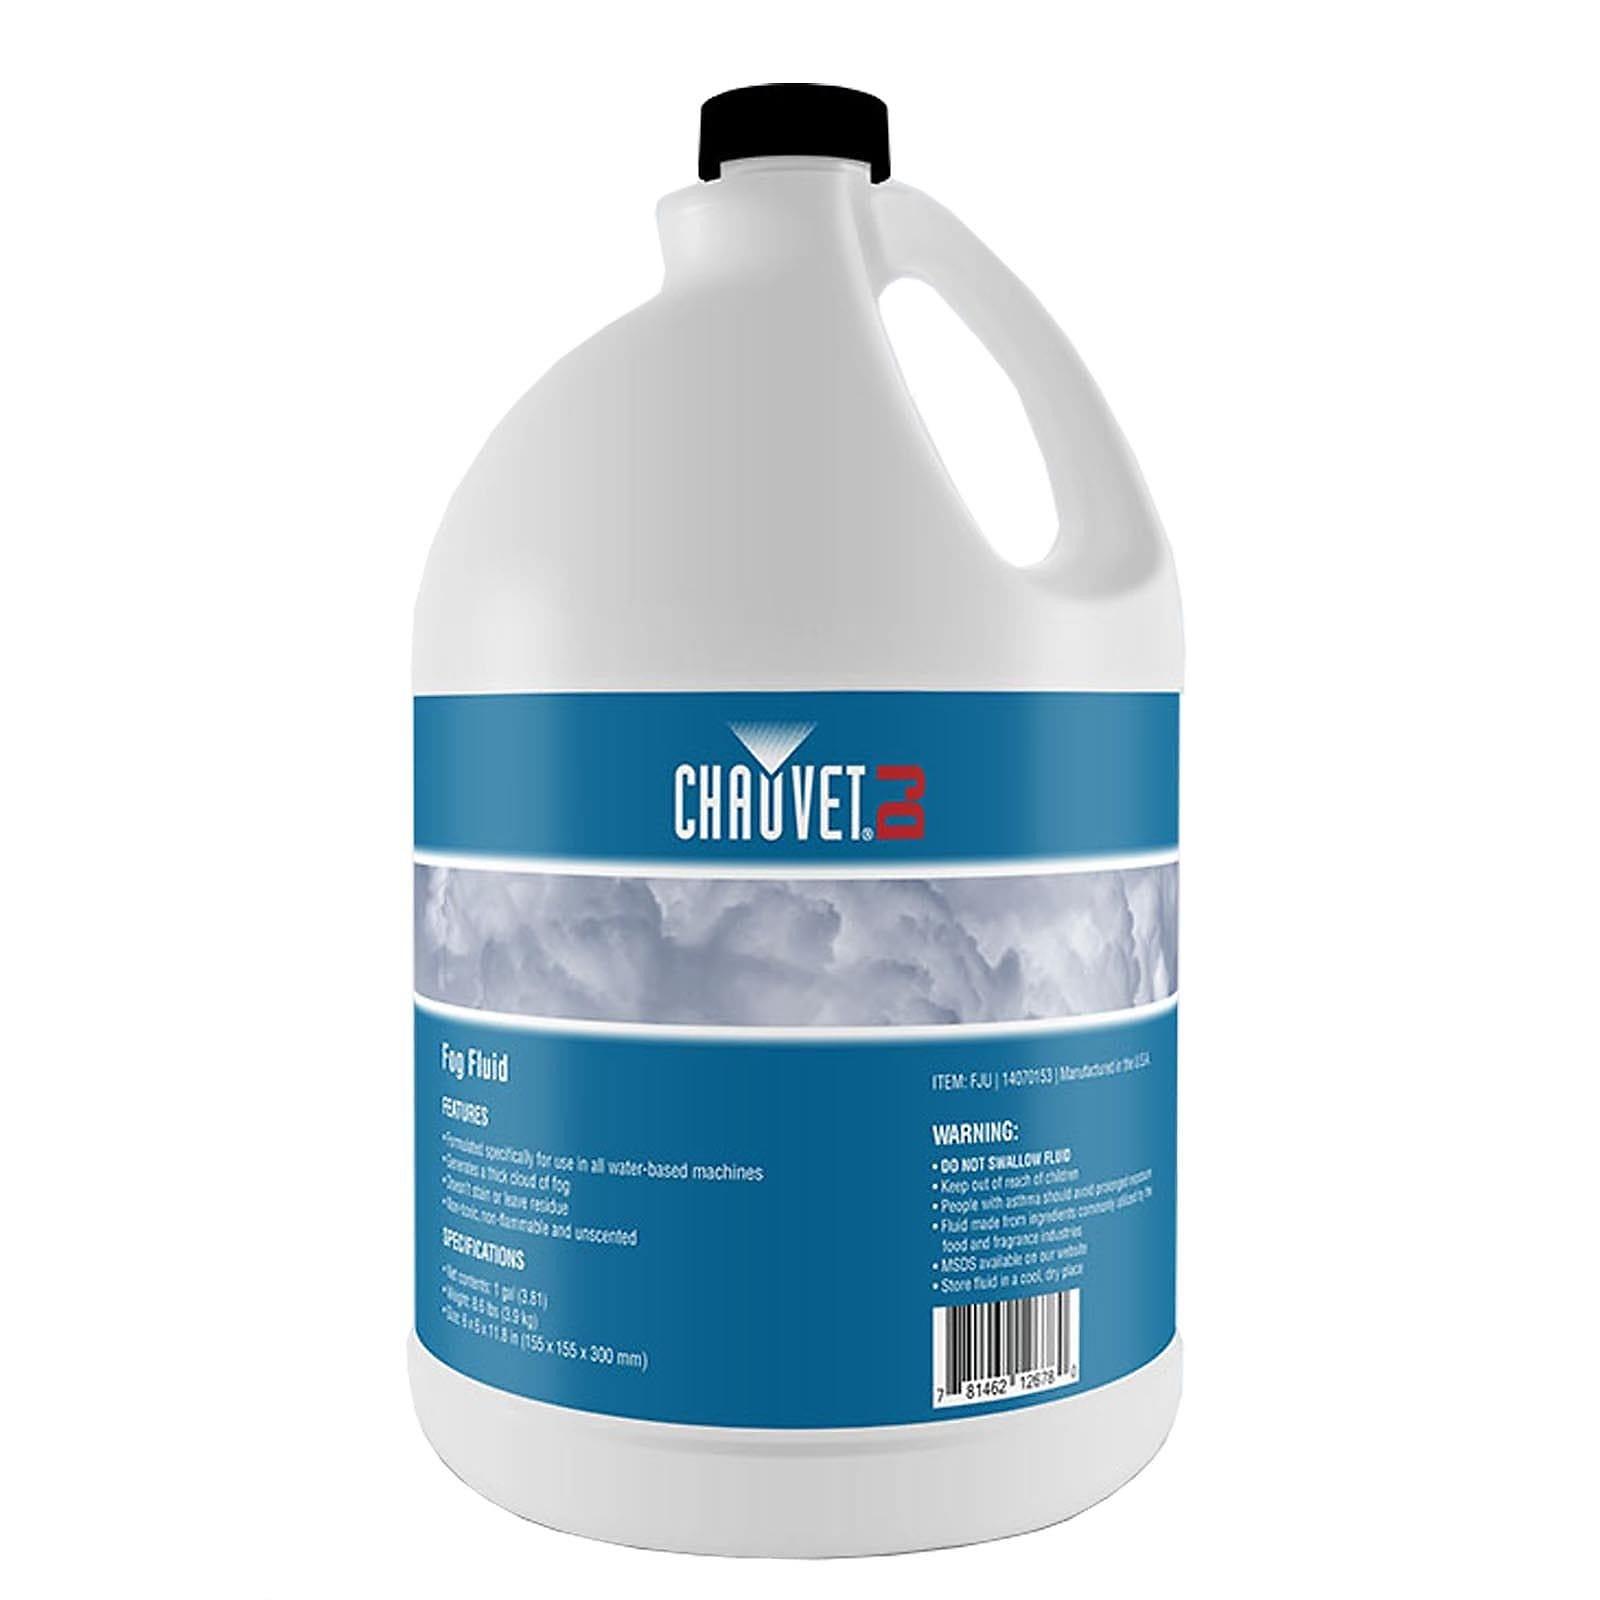 Chauvet High Performance Fog Fluid (FJU) - 1 Gallon